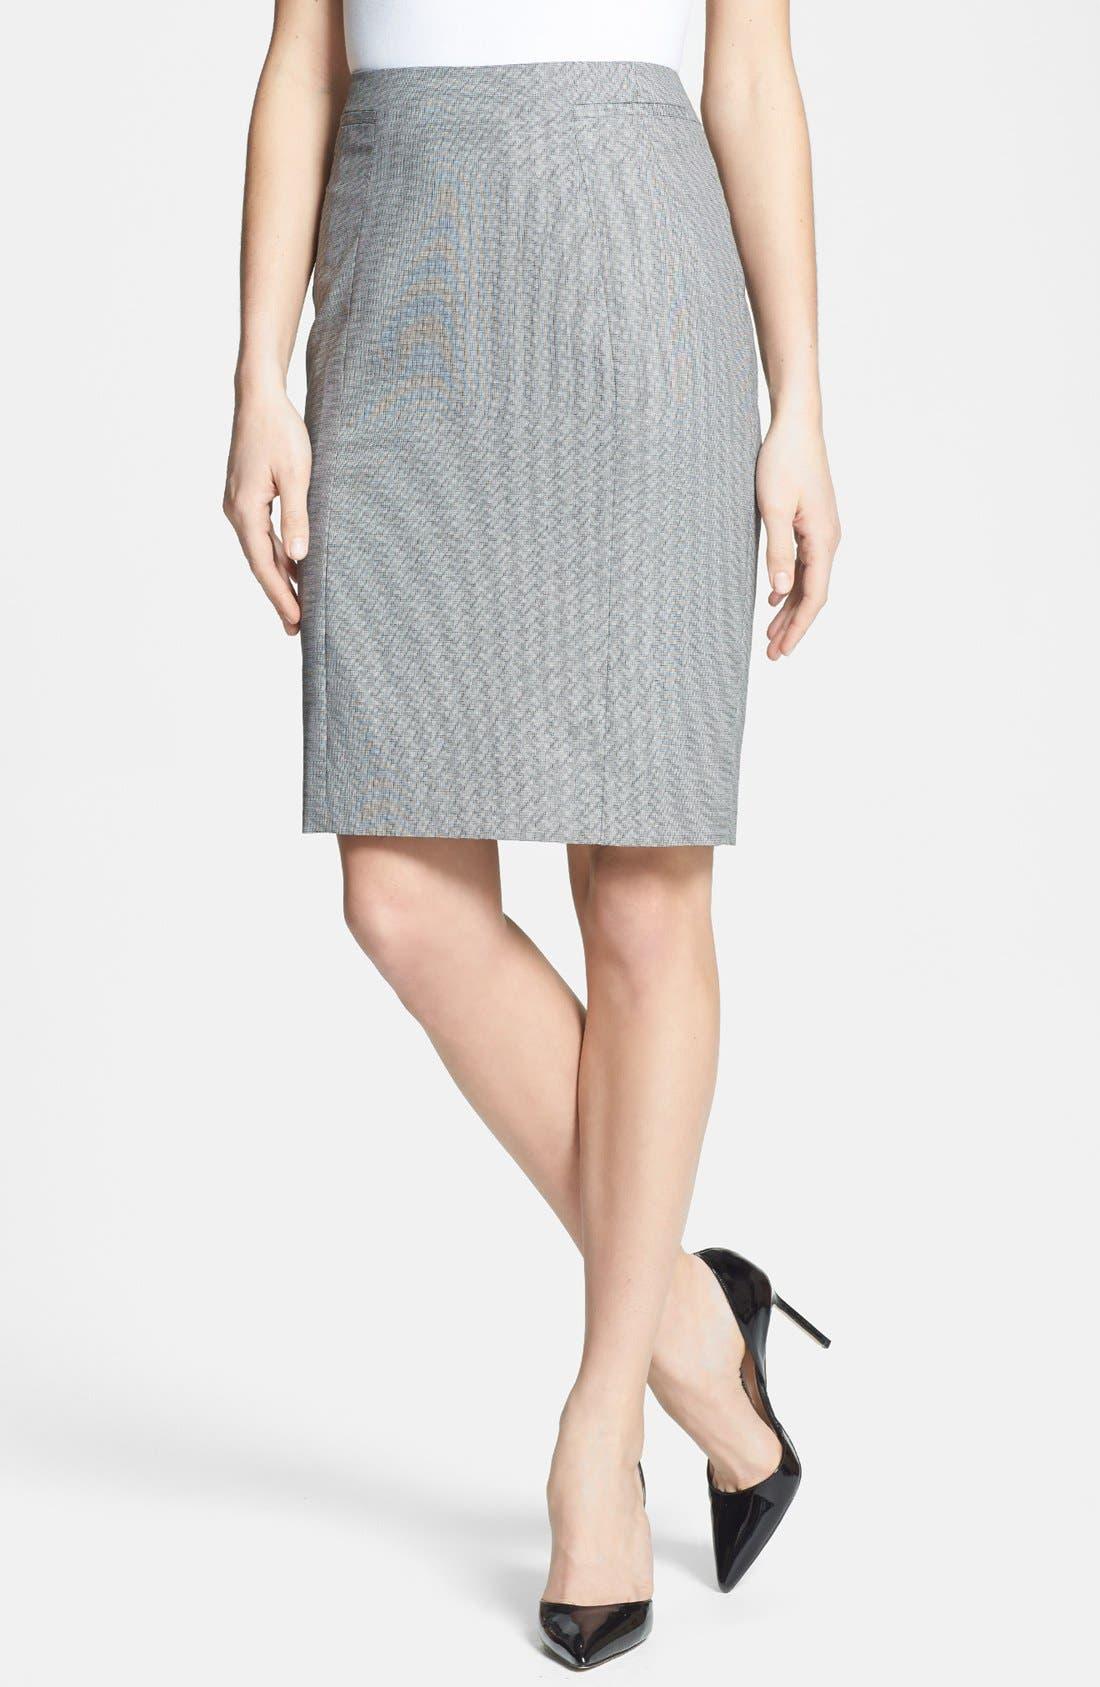 Alternate Image 1 Selected - Classiques Entier® 'Corsa Check' Pencil Skirt